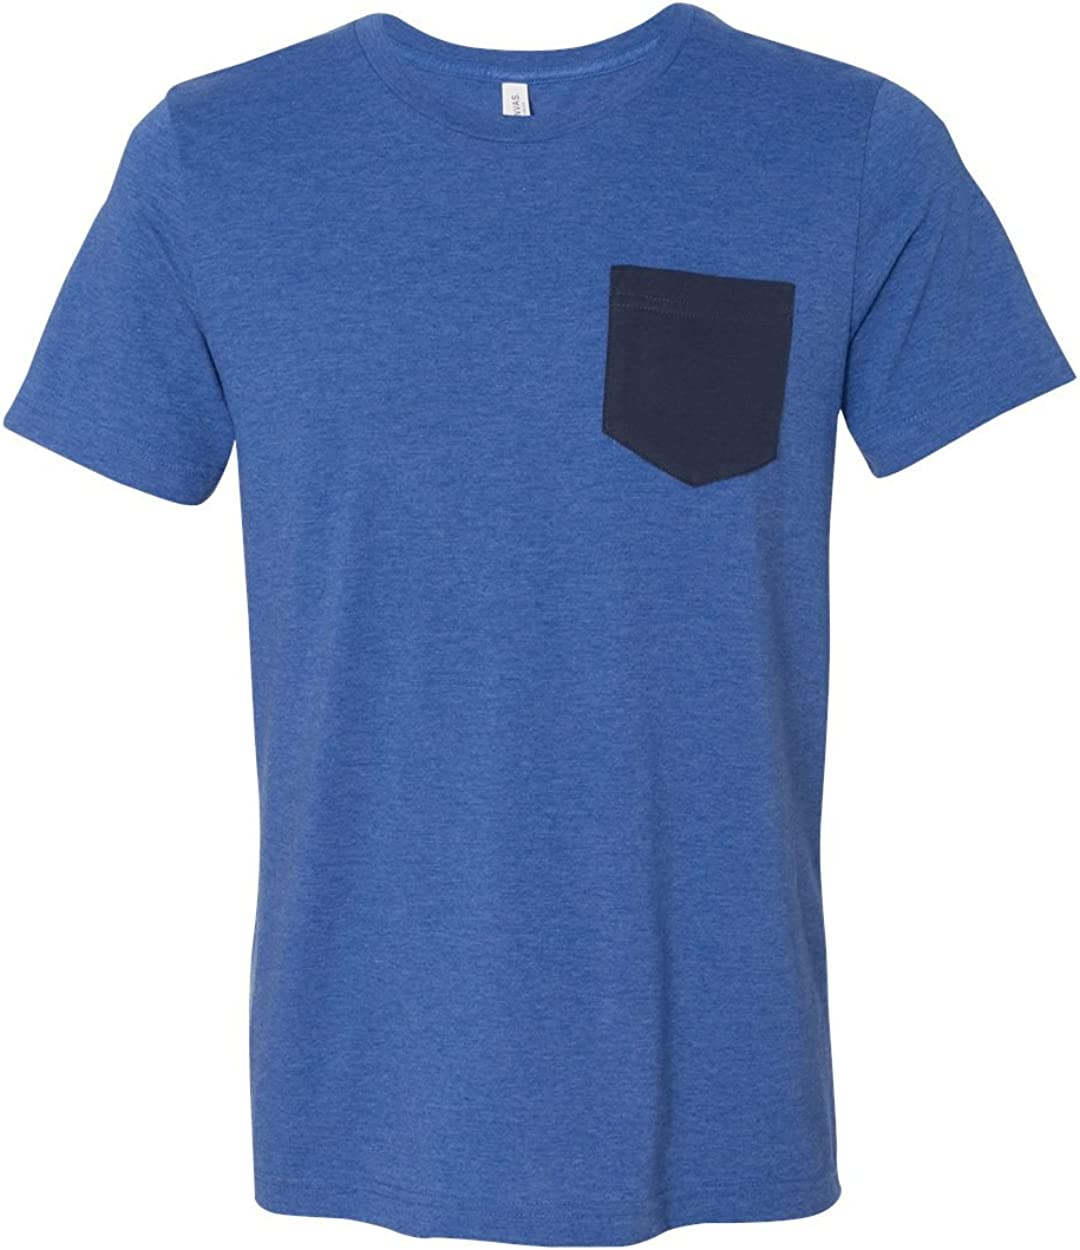 Bella + Canvas Men's Philadelphia Mall Pocket Short-Sleeve 4 years warranty T-Shirt Jersey